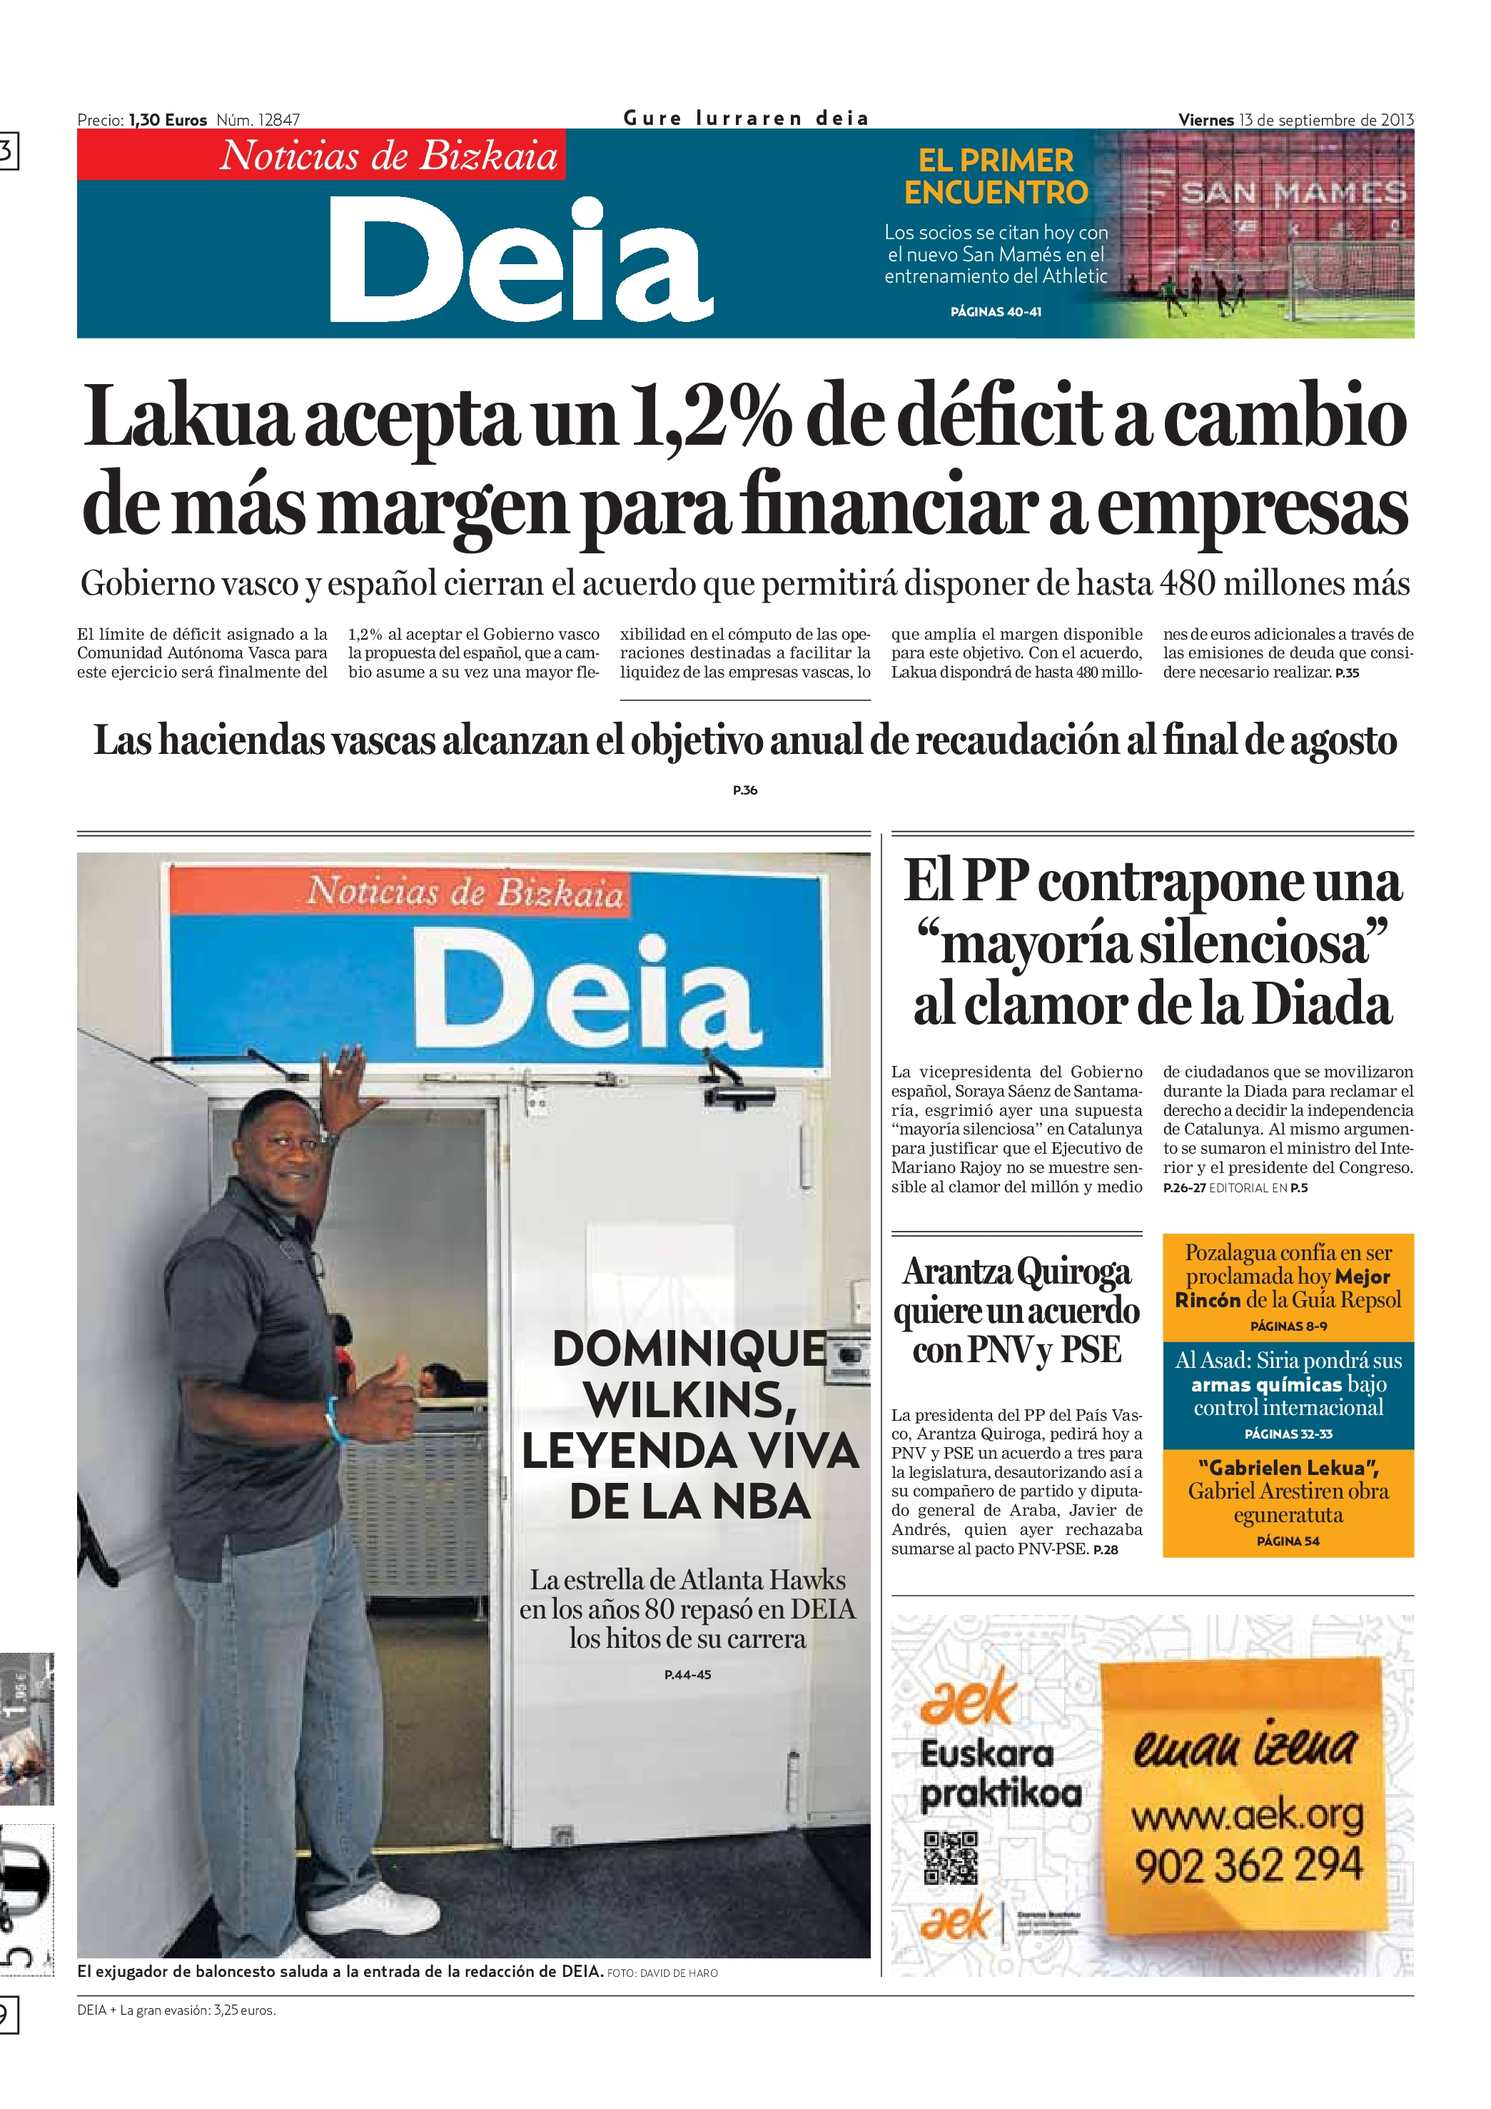 Calaméo - Deia 20130913